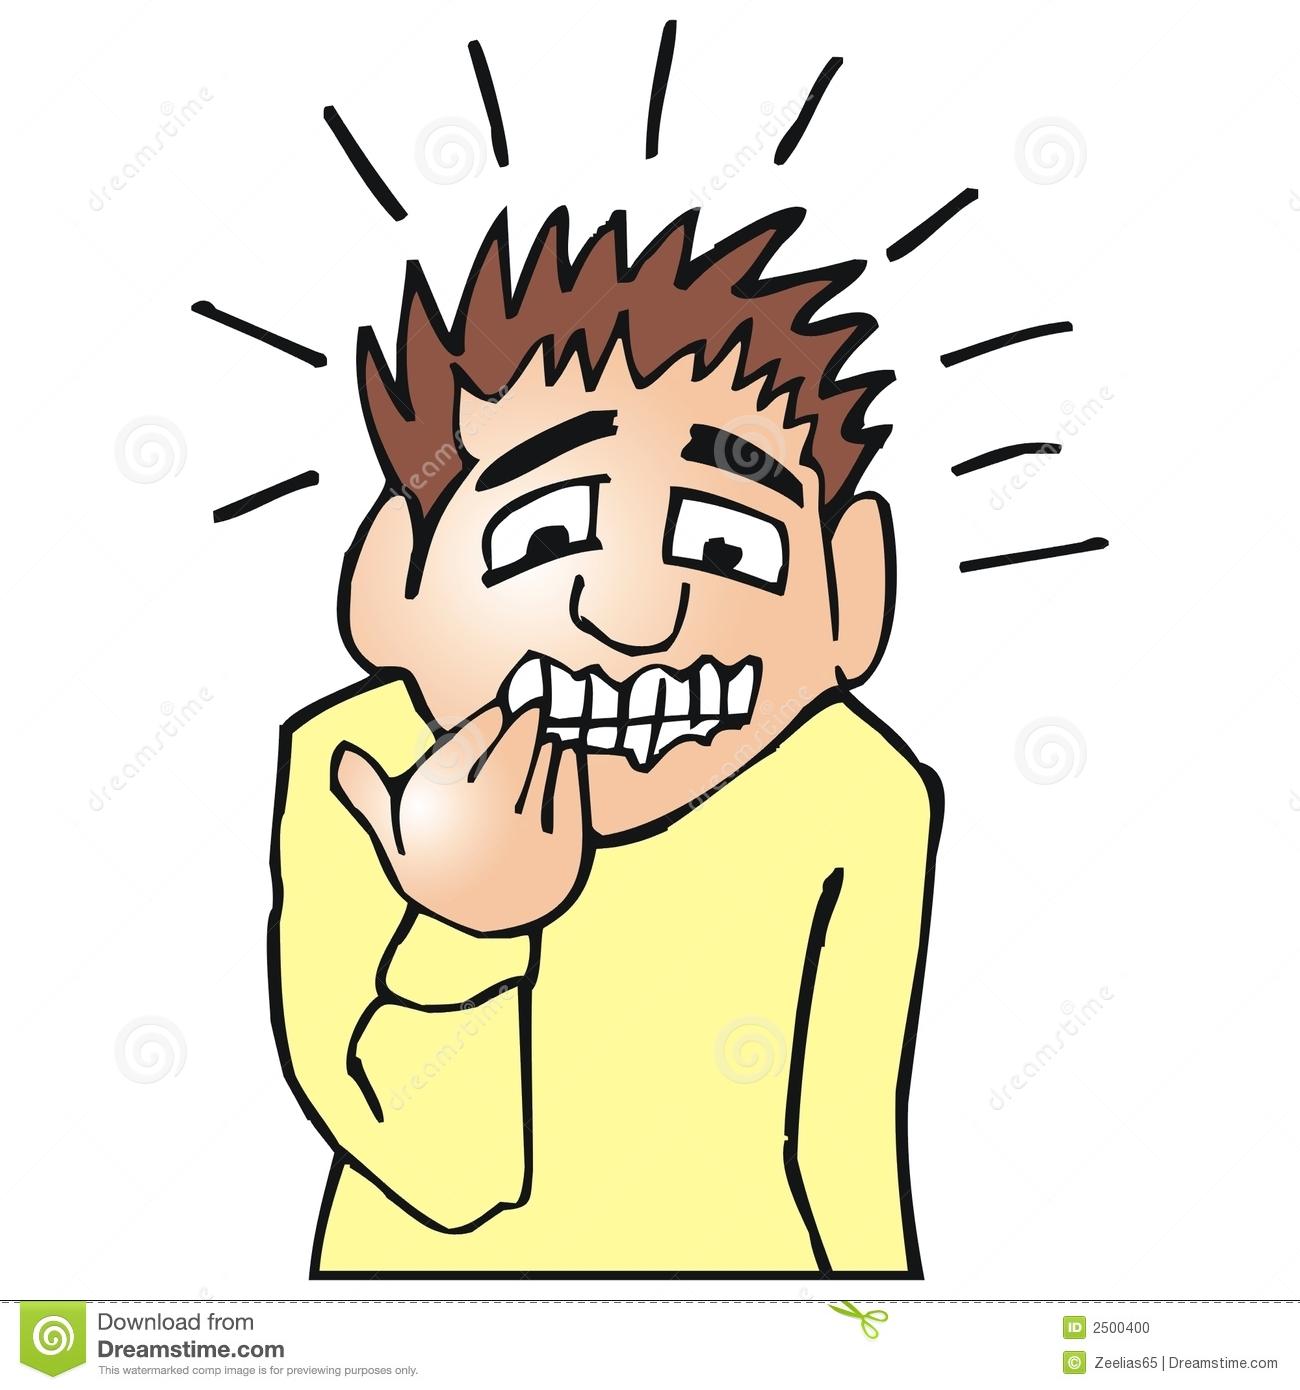 Nerves clipart embarassed Nervous+Clip+Art com/stock Clipart http://www Nervous